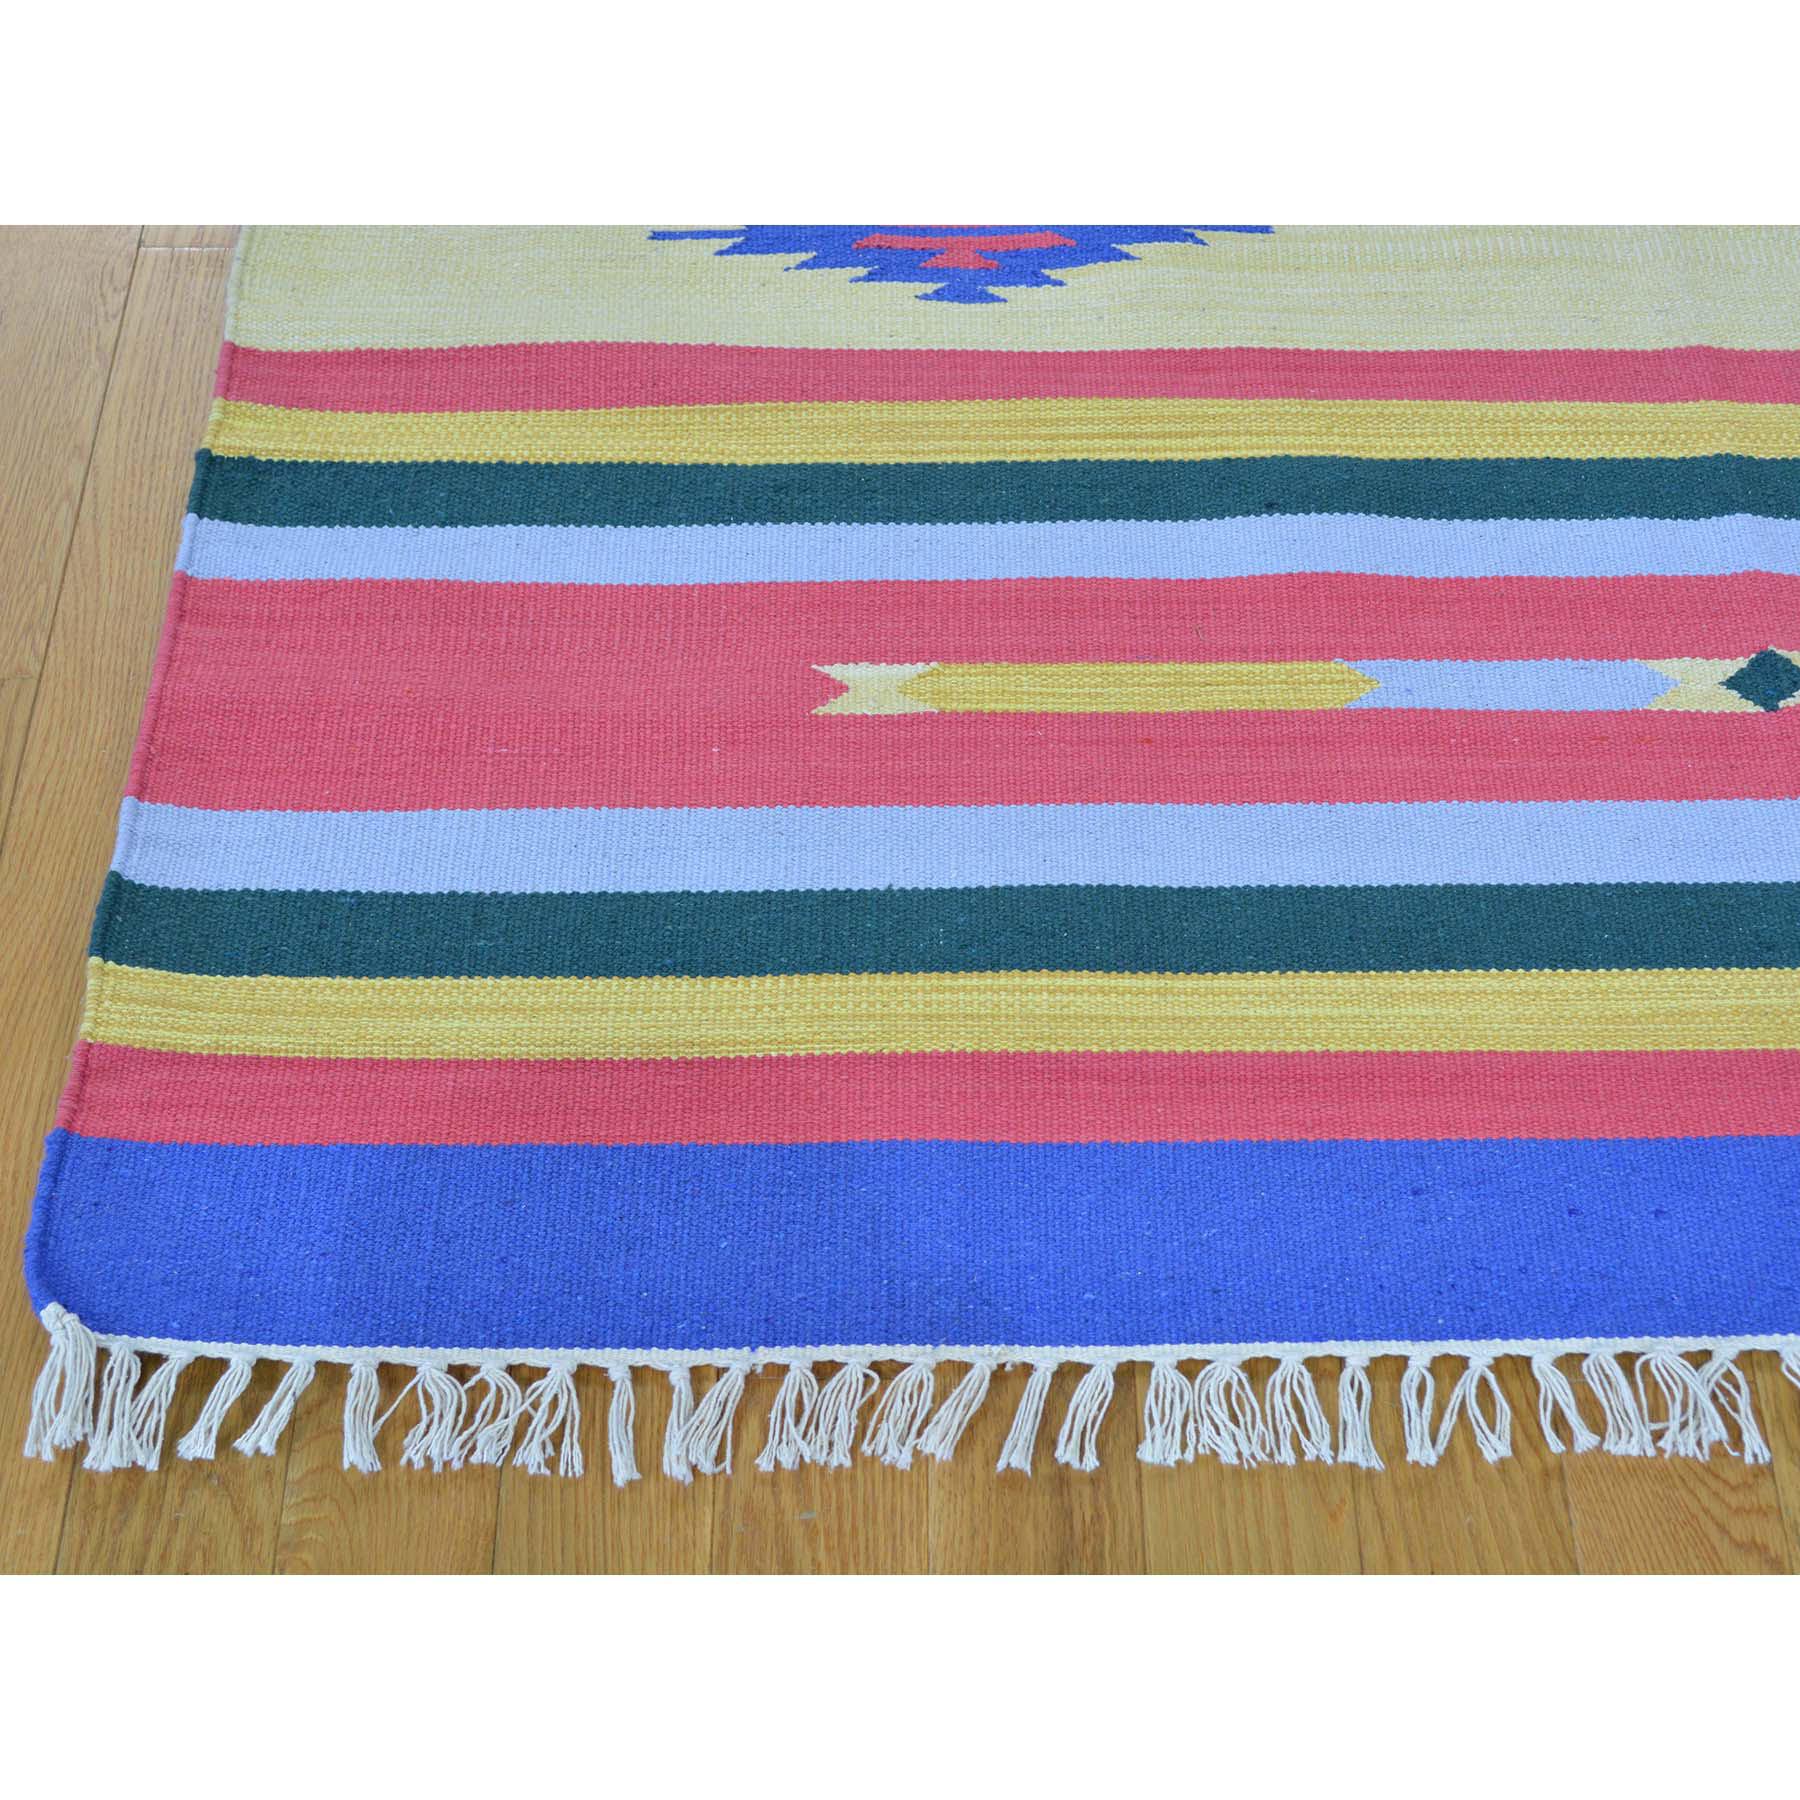 5-x7-1  Navajo Design Flat Weave Kilim Hand Woven Rug